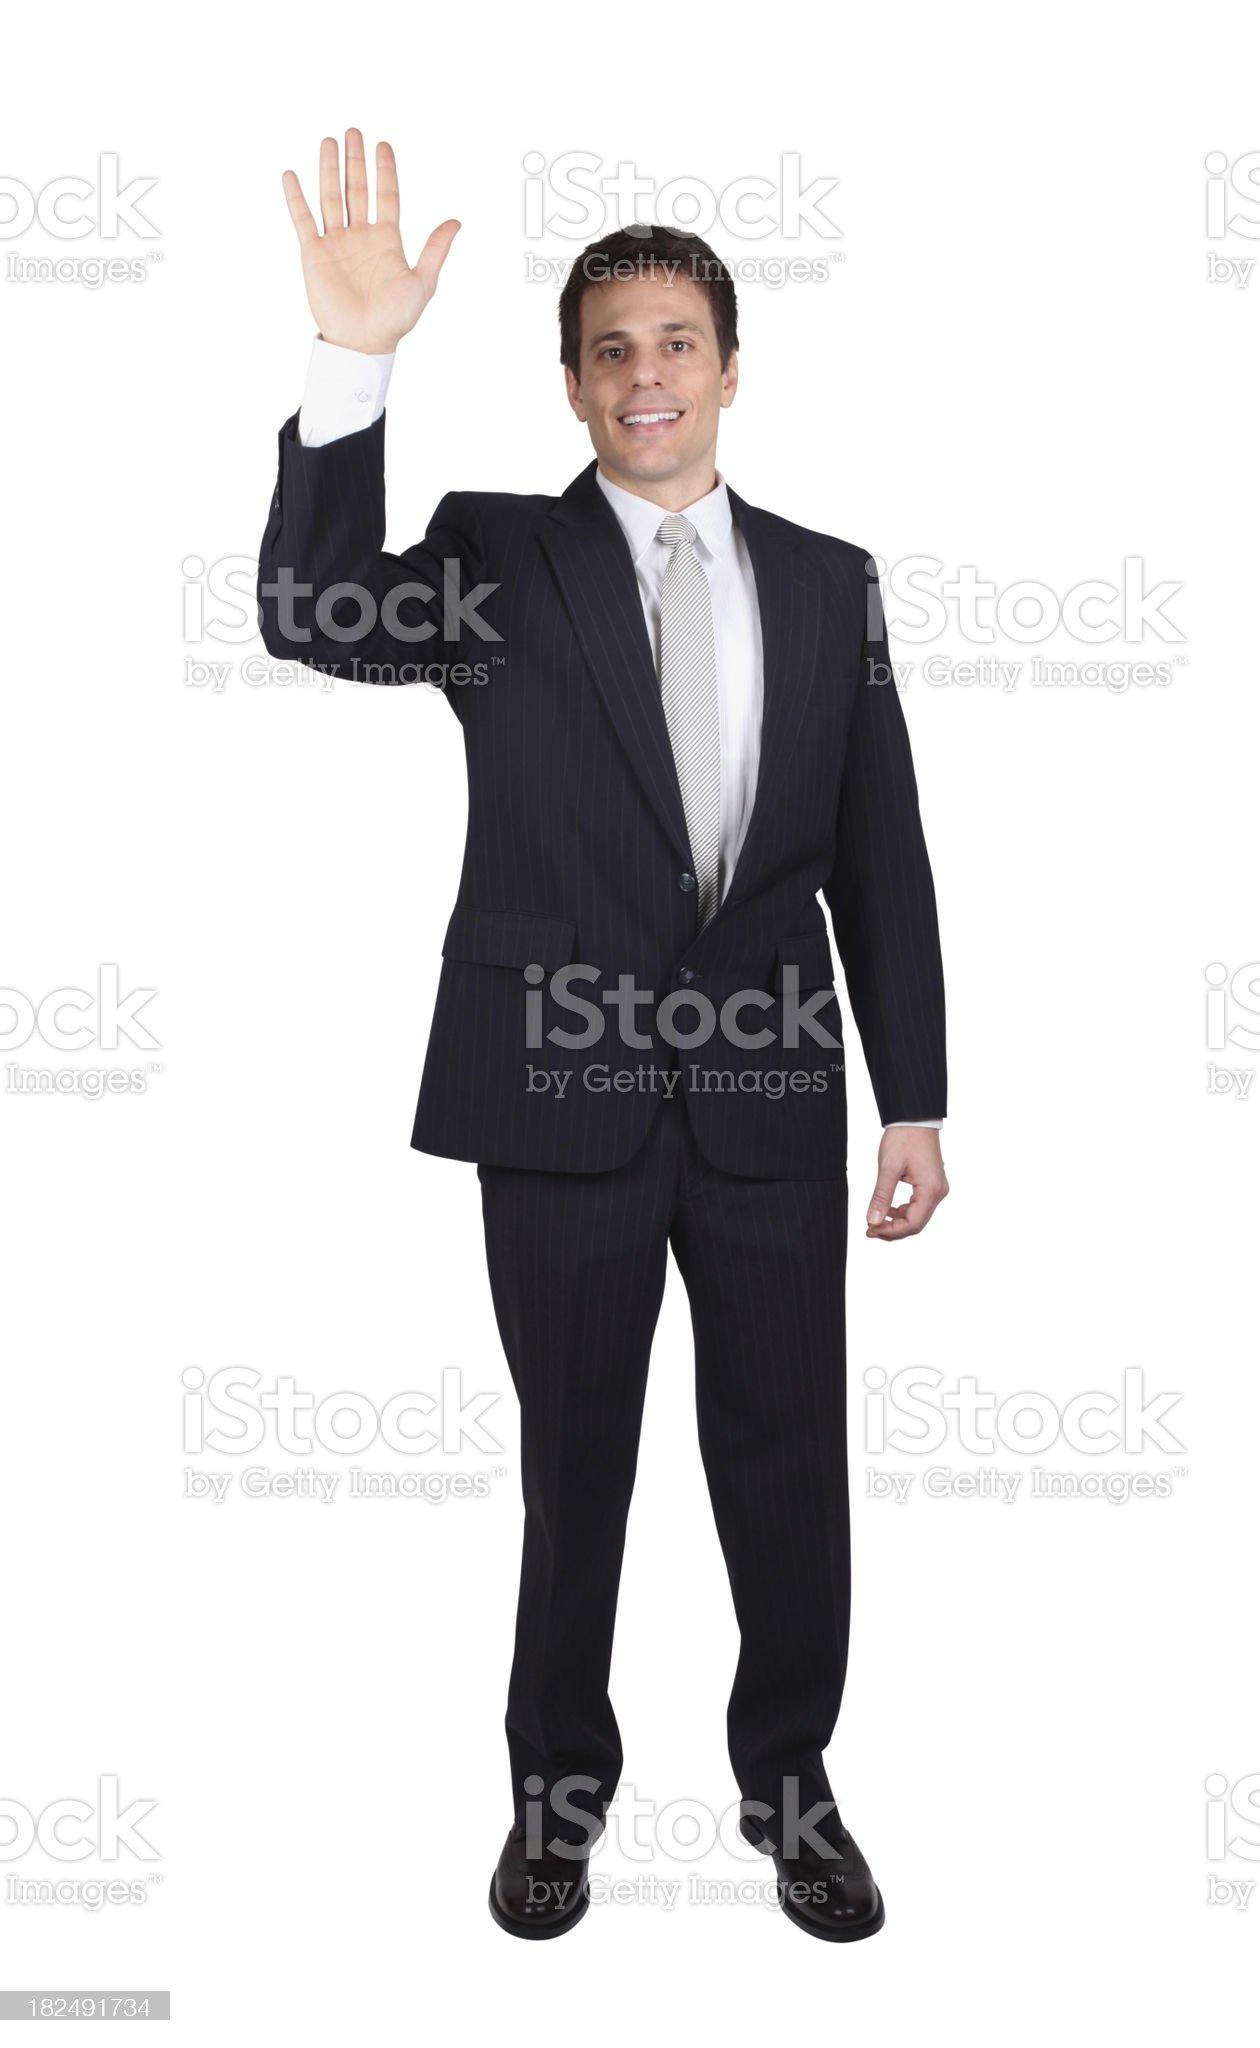 Isolated businessman waving royalty-free stock photo